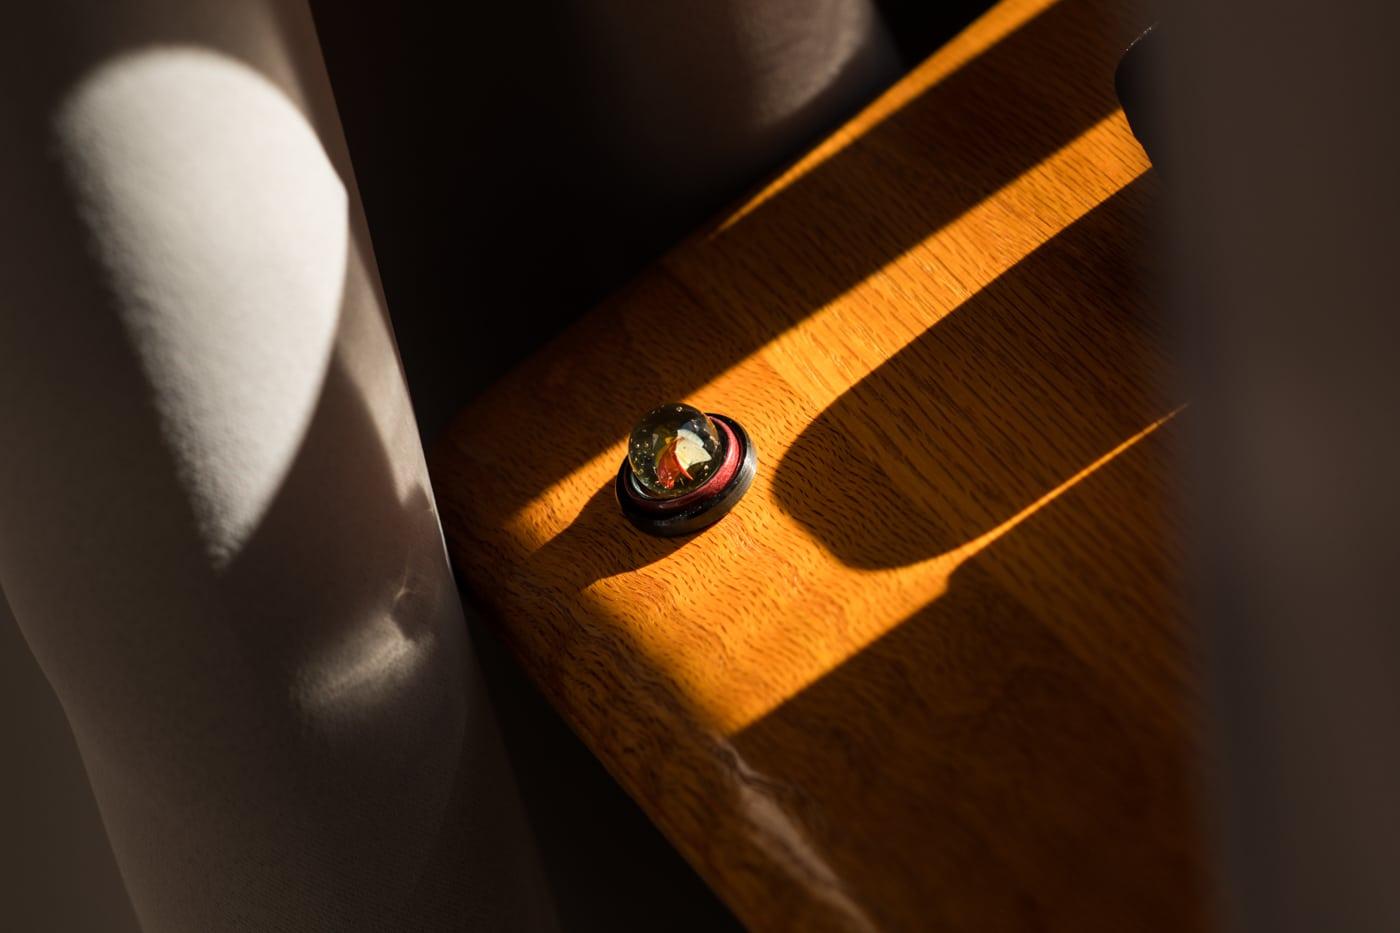 wedding rings rest on wood